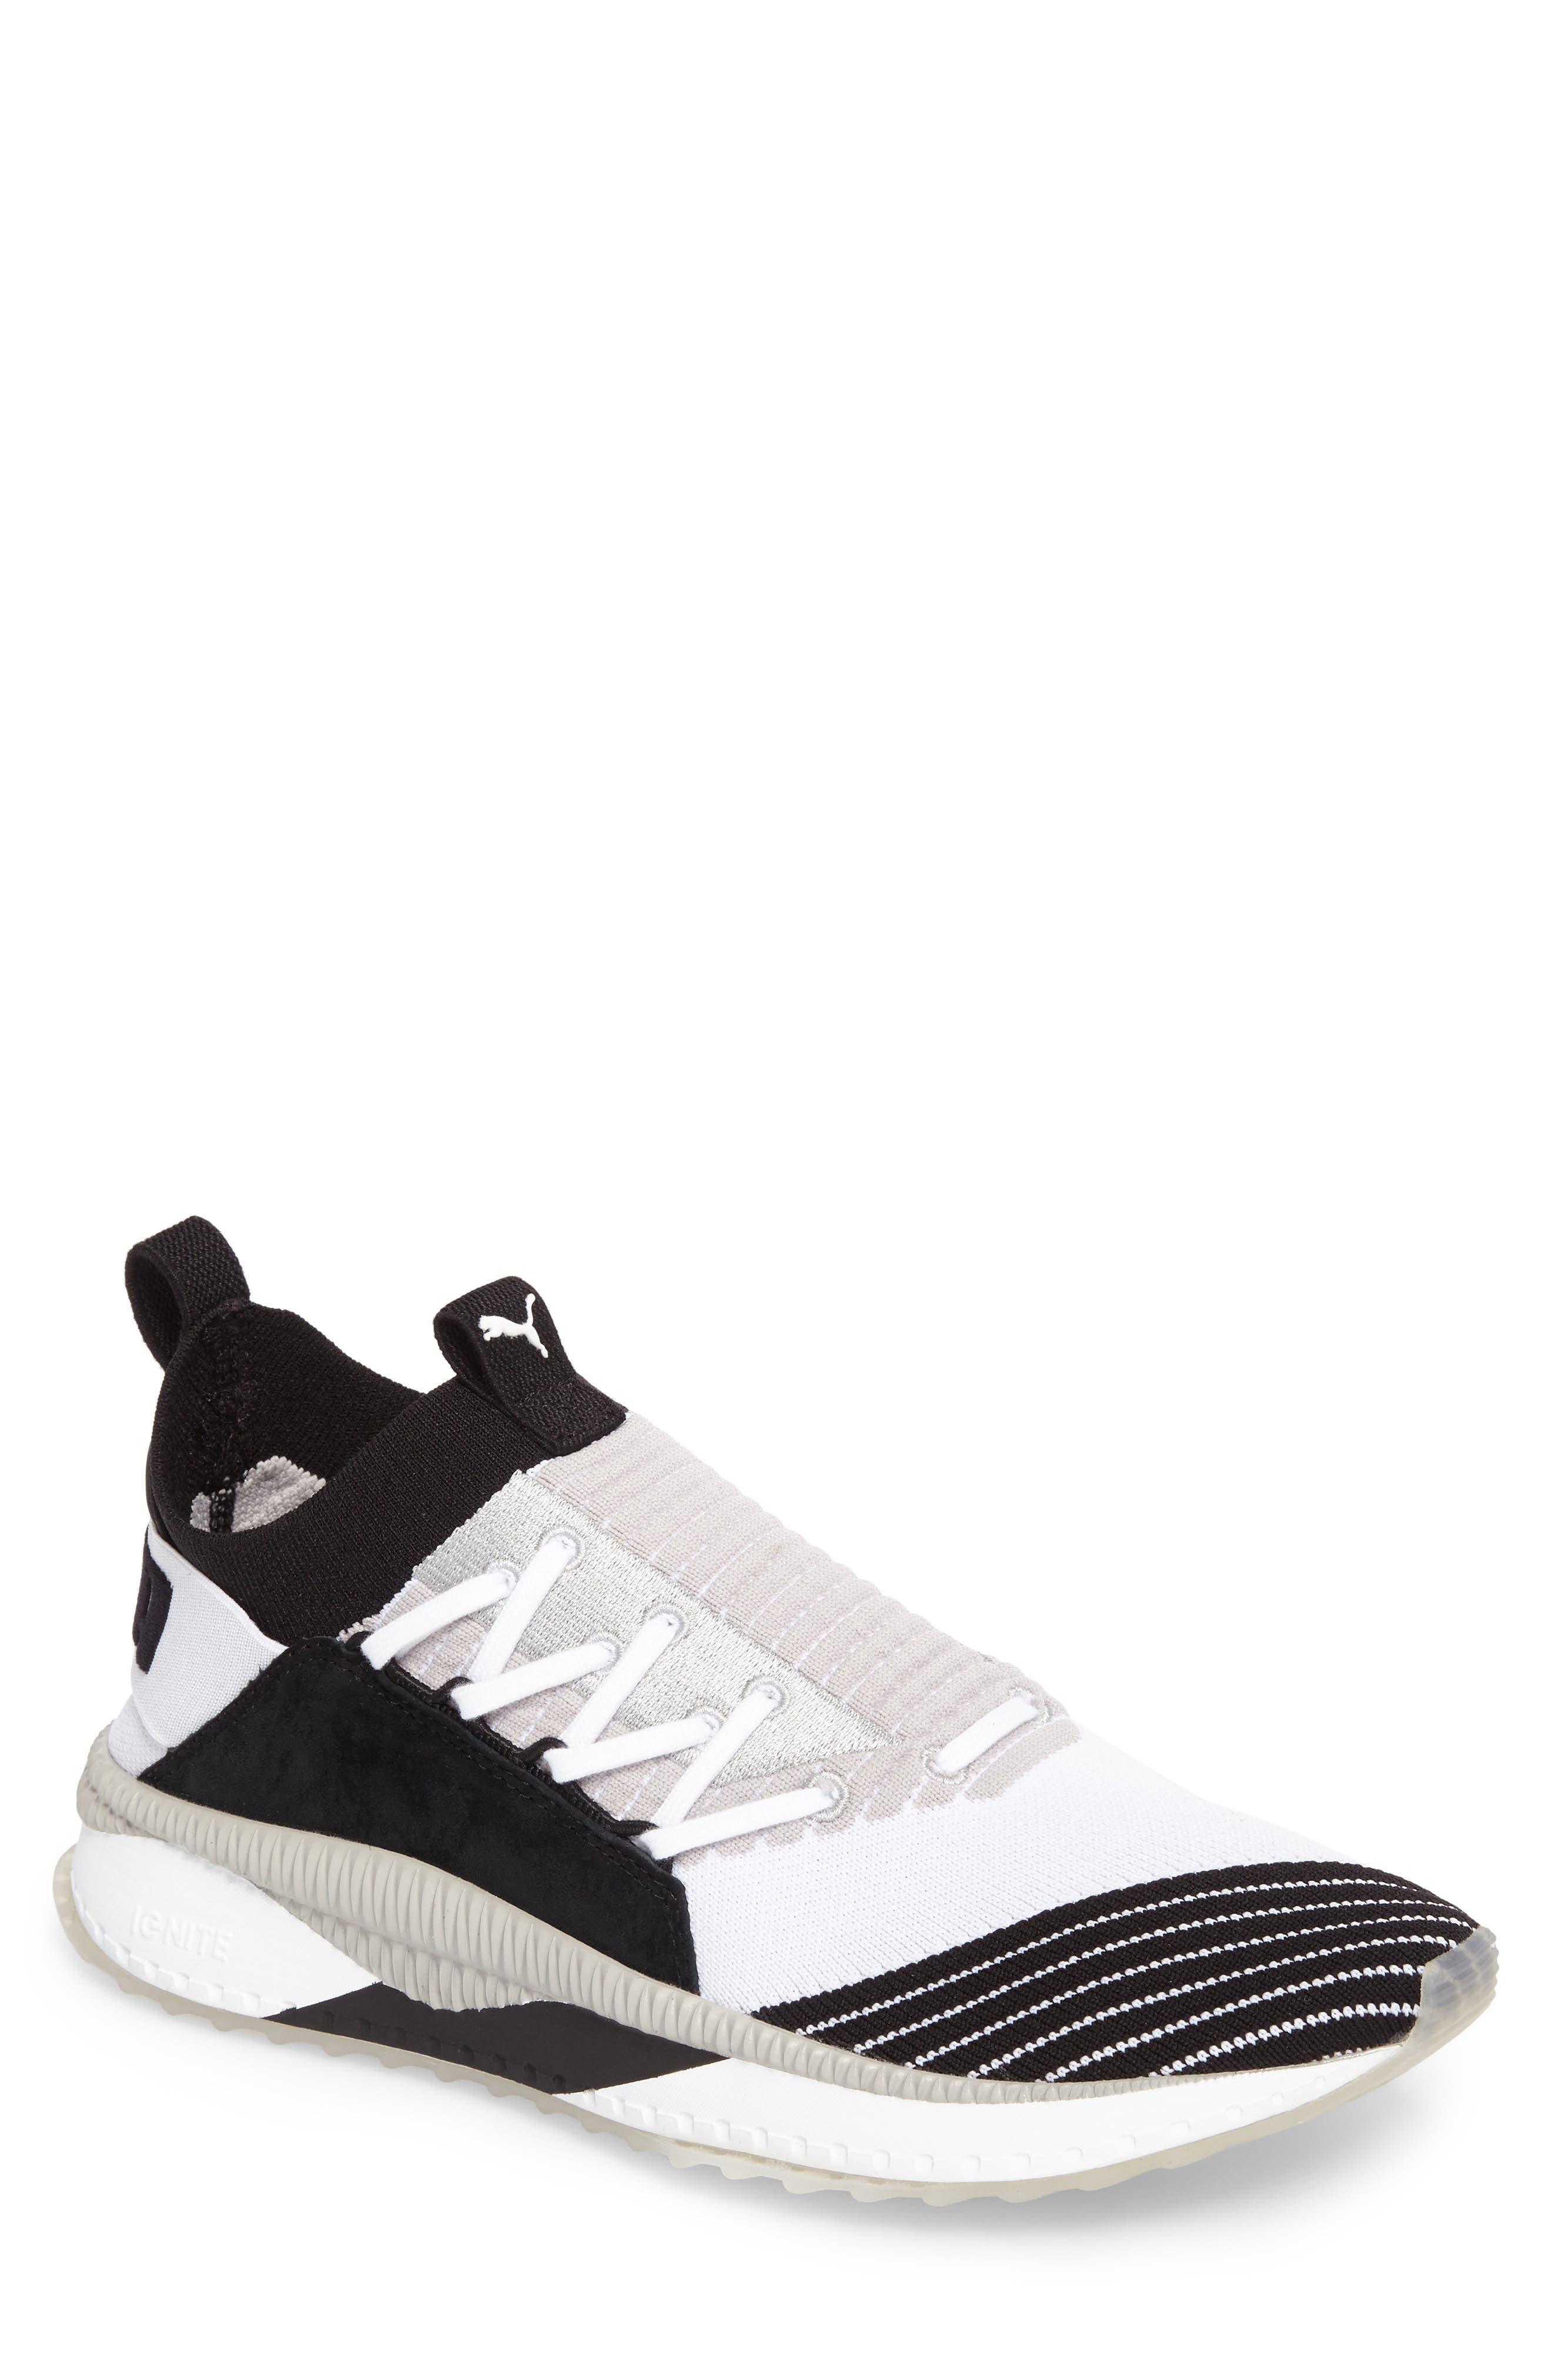 Tsugi Shinsei UT Odyssey Sneaker,                             Main thumbnail 2, color,